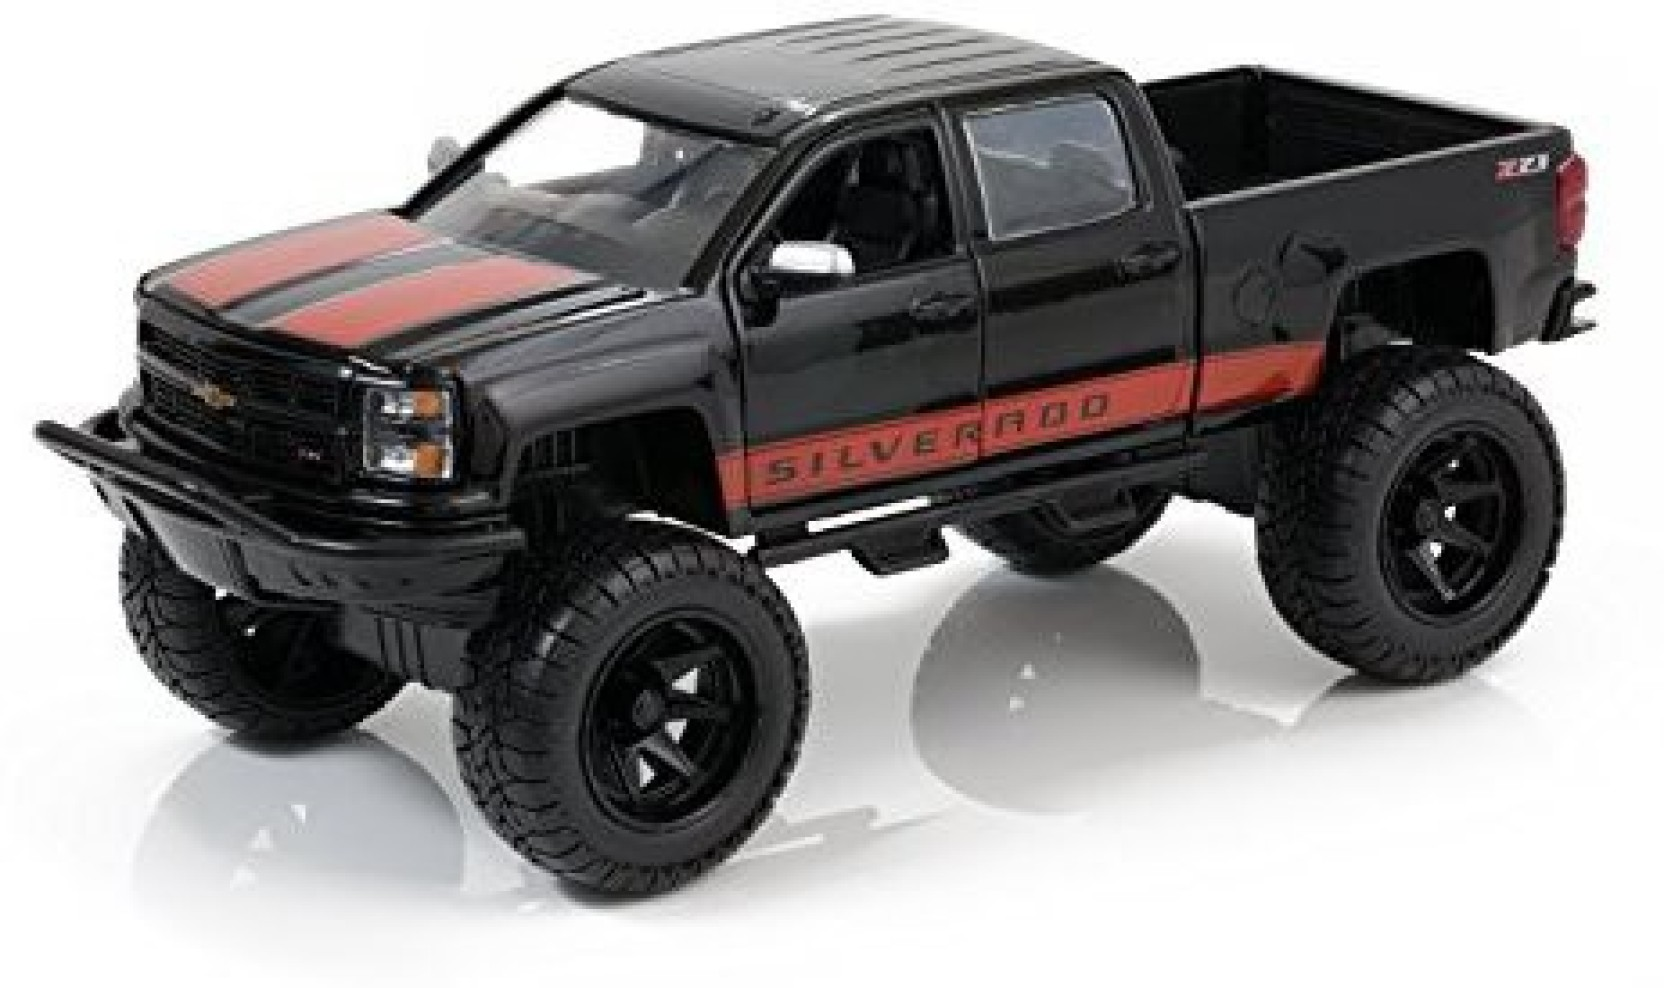 Just Chevy Trucks >> Generic 2014 Chevy Silverado Pickup Black W Red Details